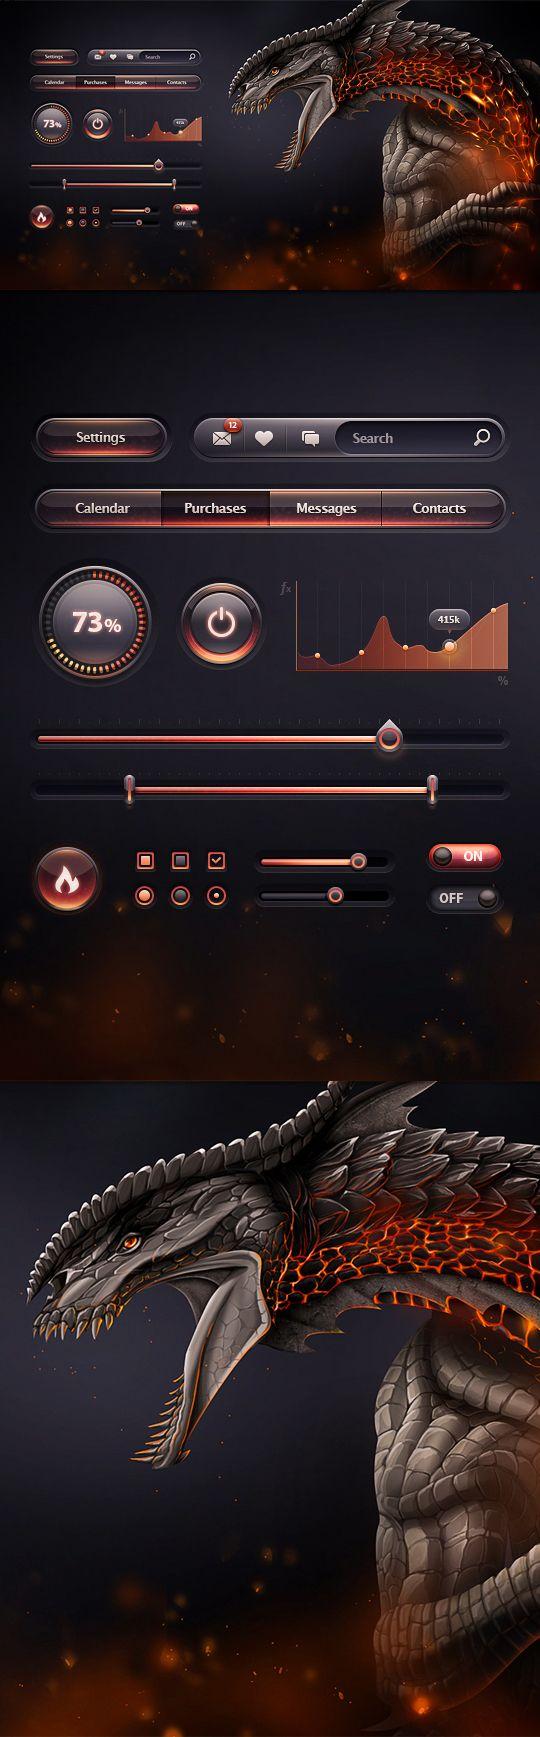 Portfolio 2012-2013 | UI Concepts by Mike , via Behance